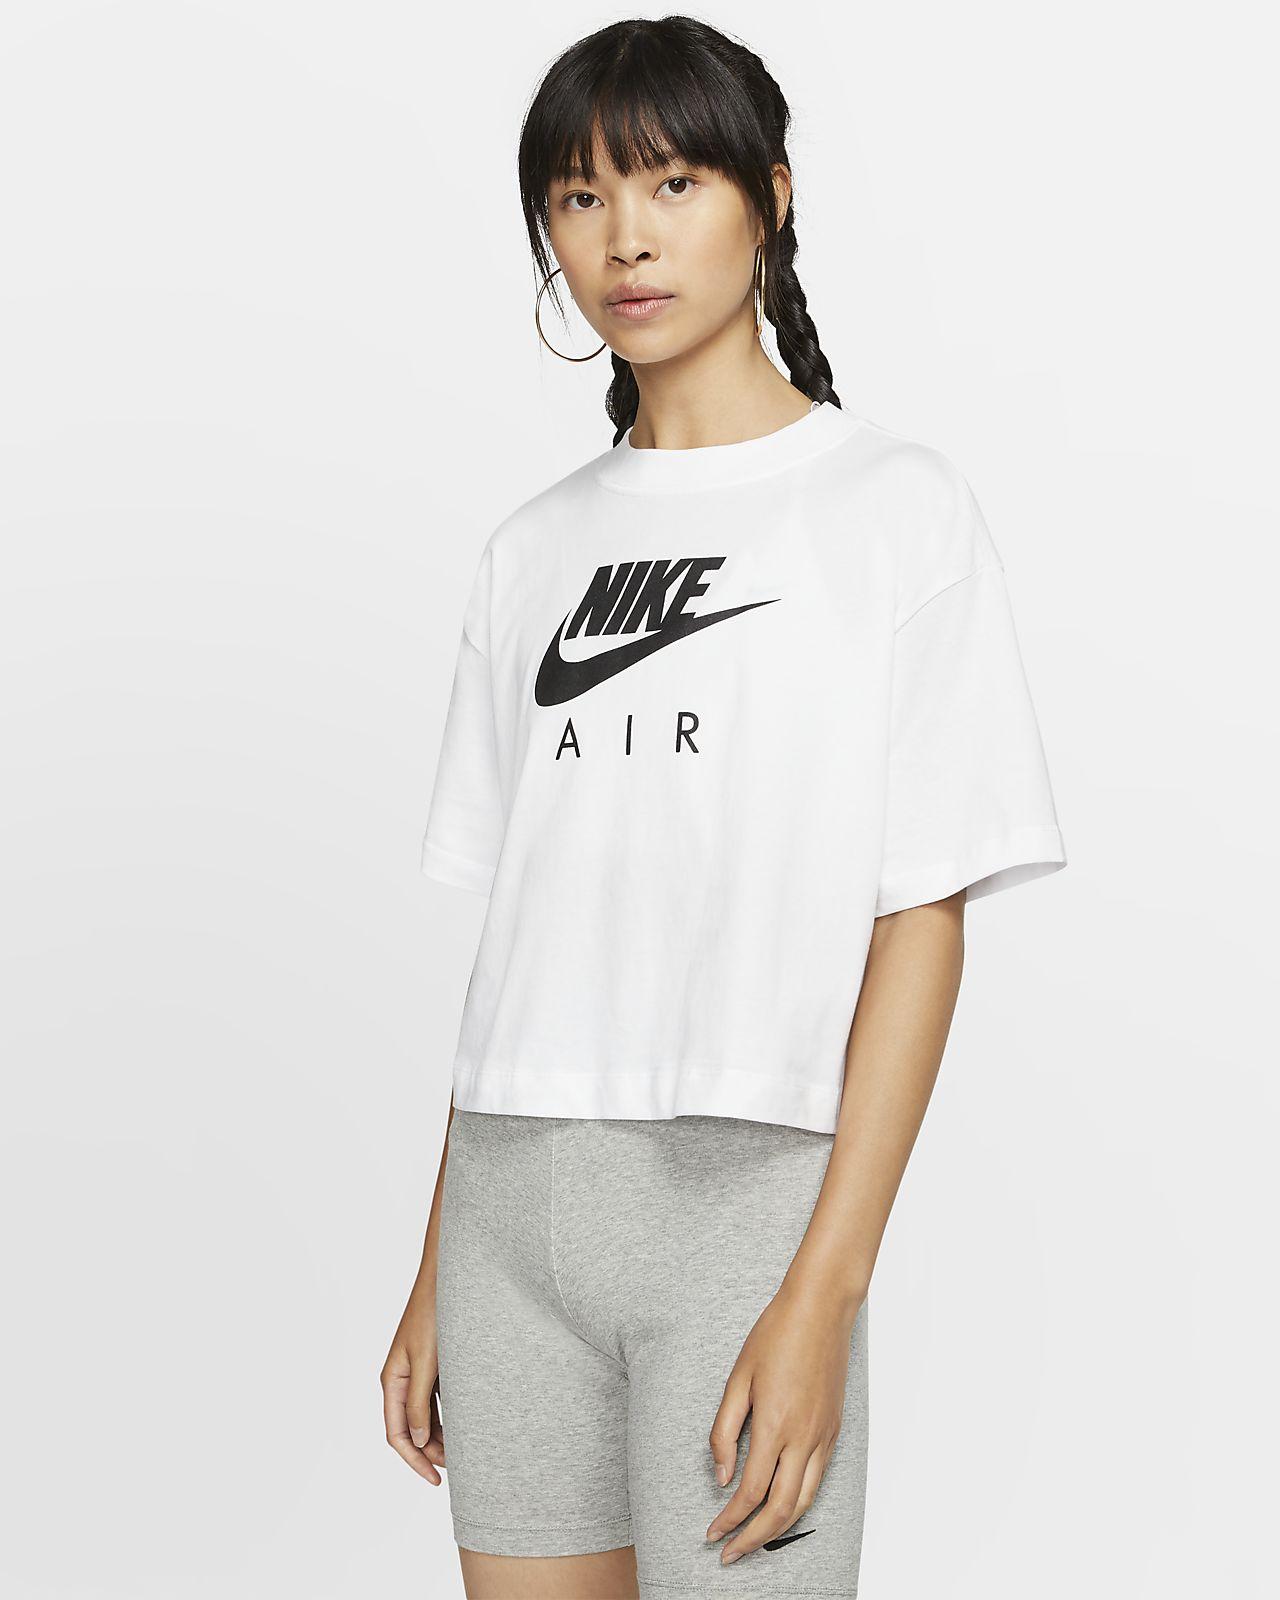 Nike Air Women's Short-Sleeve Top